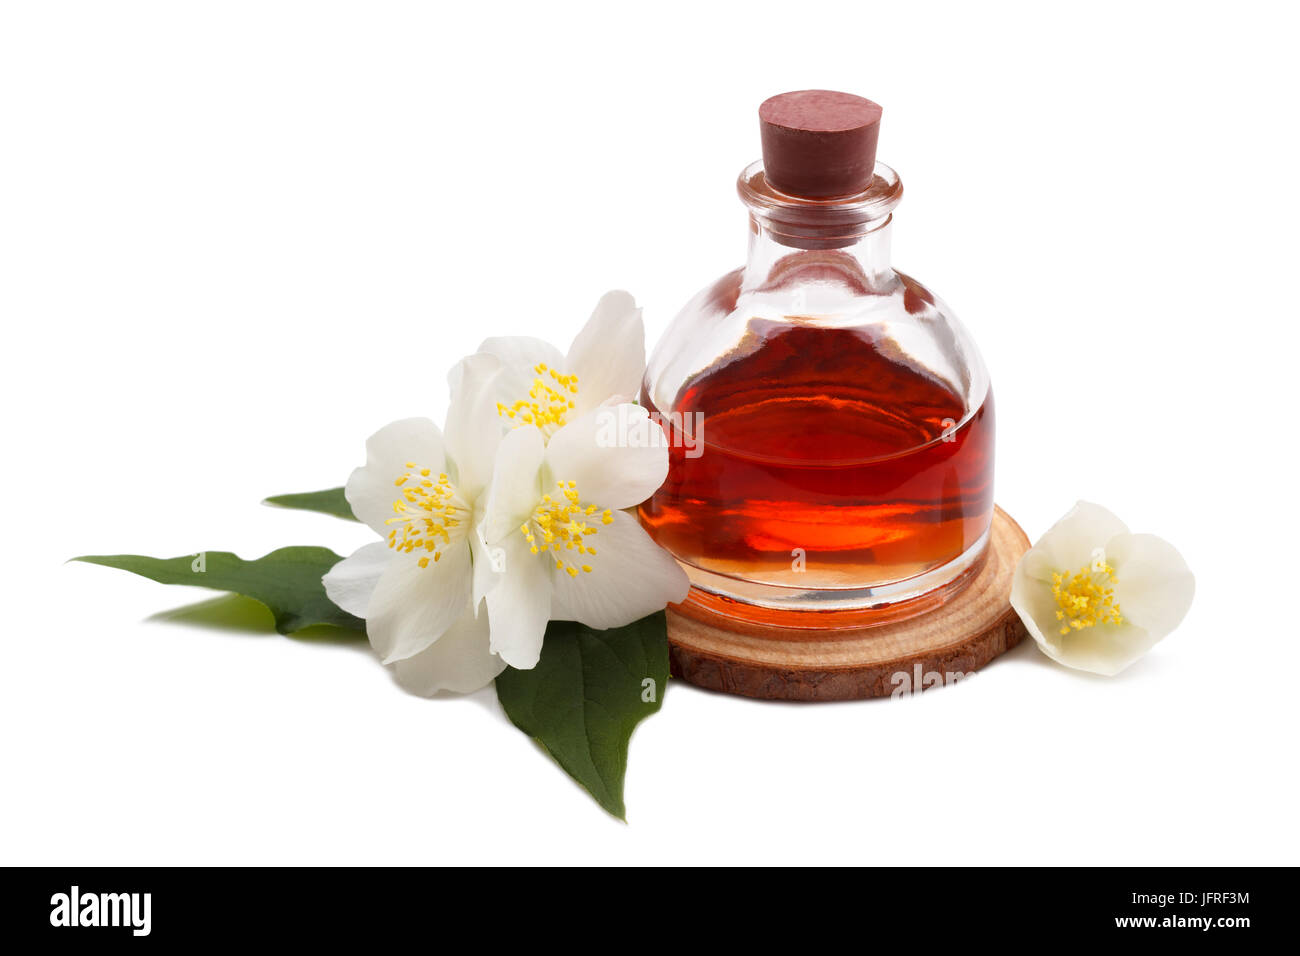 Perfume bottle jasmine flower stock photos perfume bottle jasmine essential oil with jasmine flower stock image izmirmasajfo